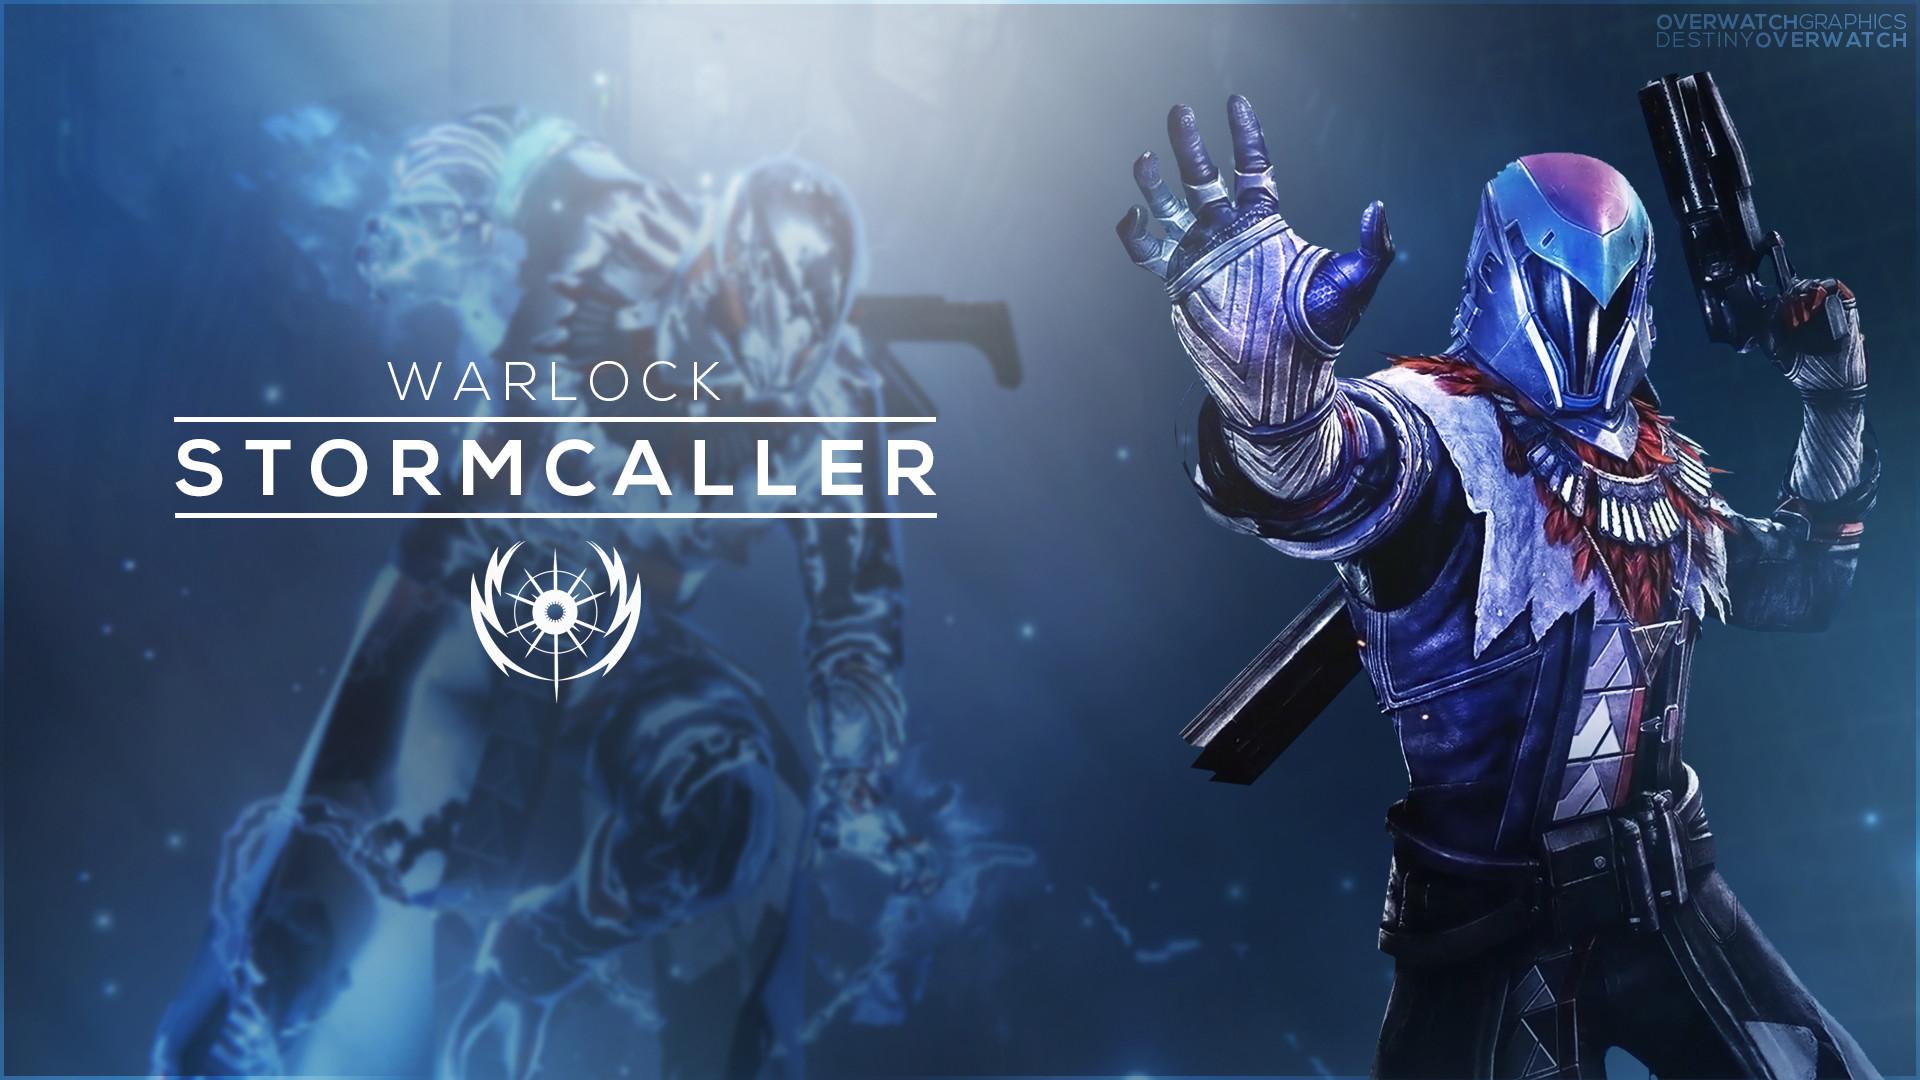 … OverwatchGraphics Destiny the Game – Stormcaller Phone Wallpaper by  OverwatchGraphics